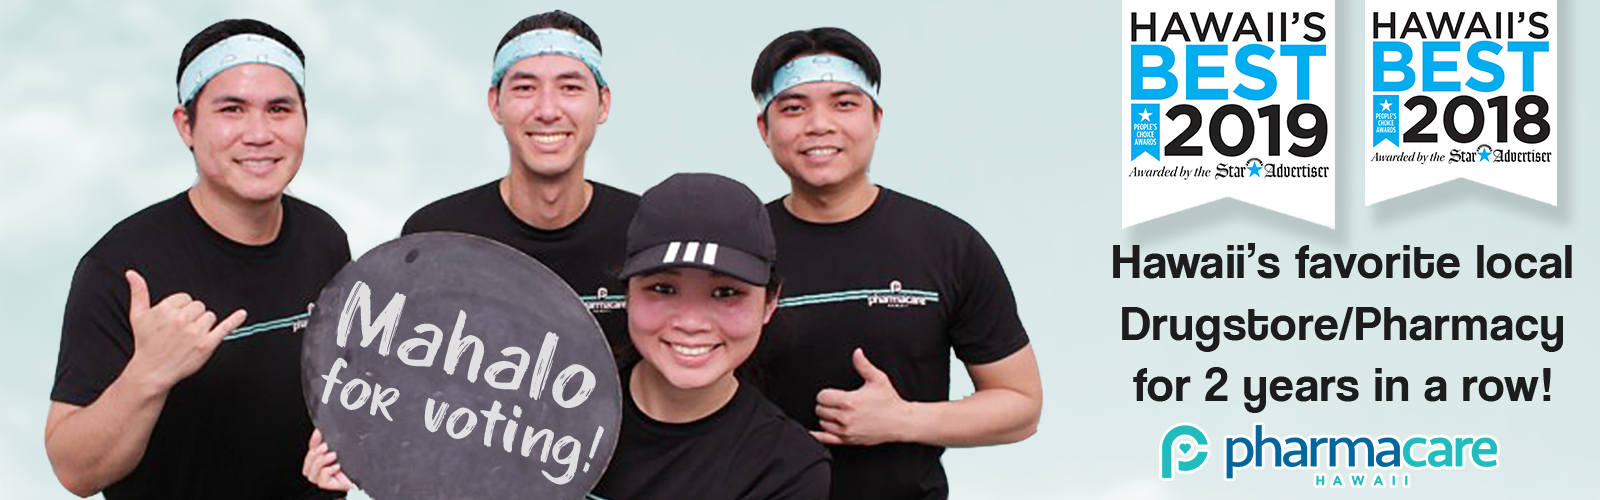 Star Advertiser_Hawaii's Best 2019 - Website1600x500.png